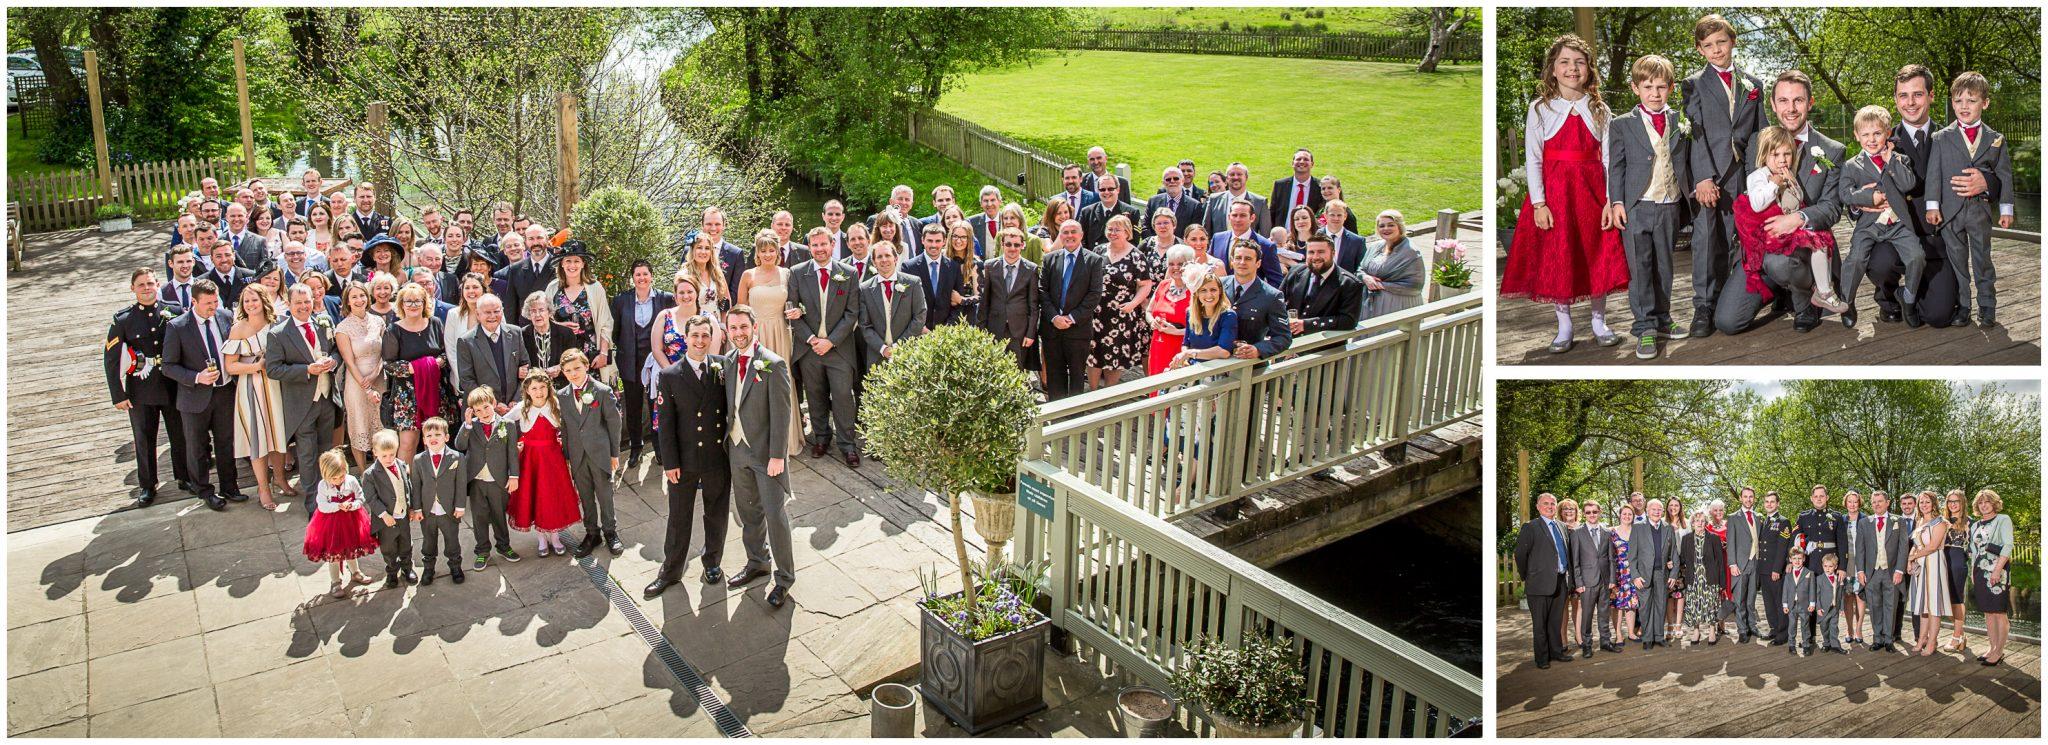 Sopley wedding photographer group photographs